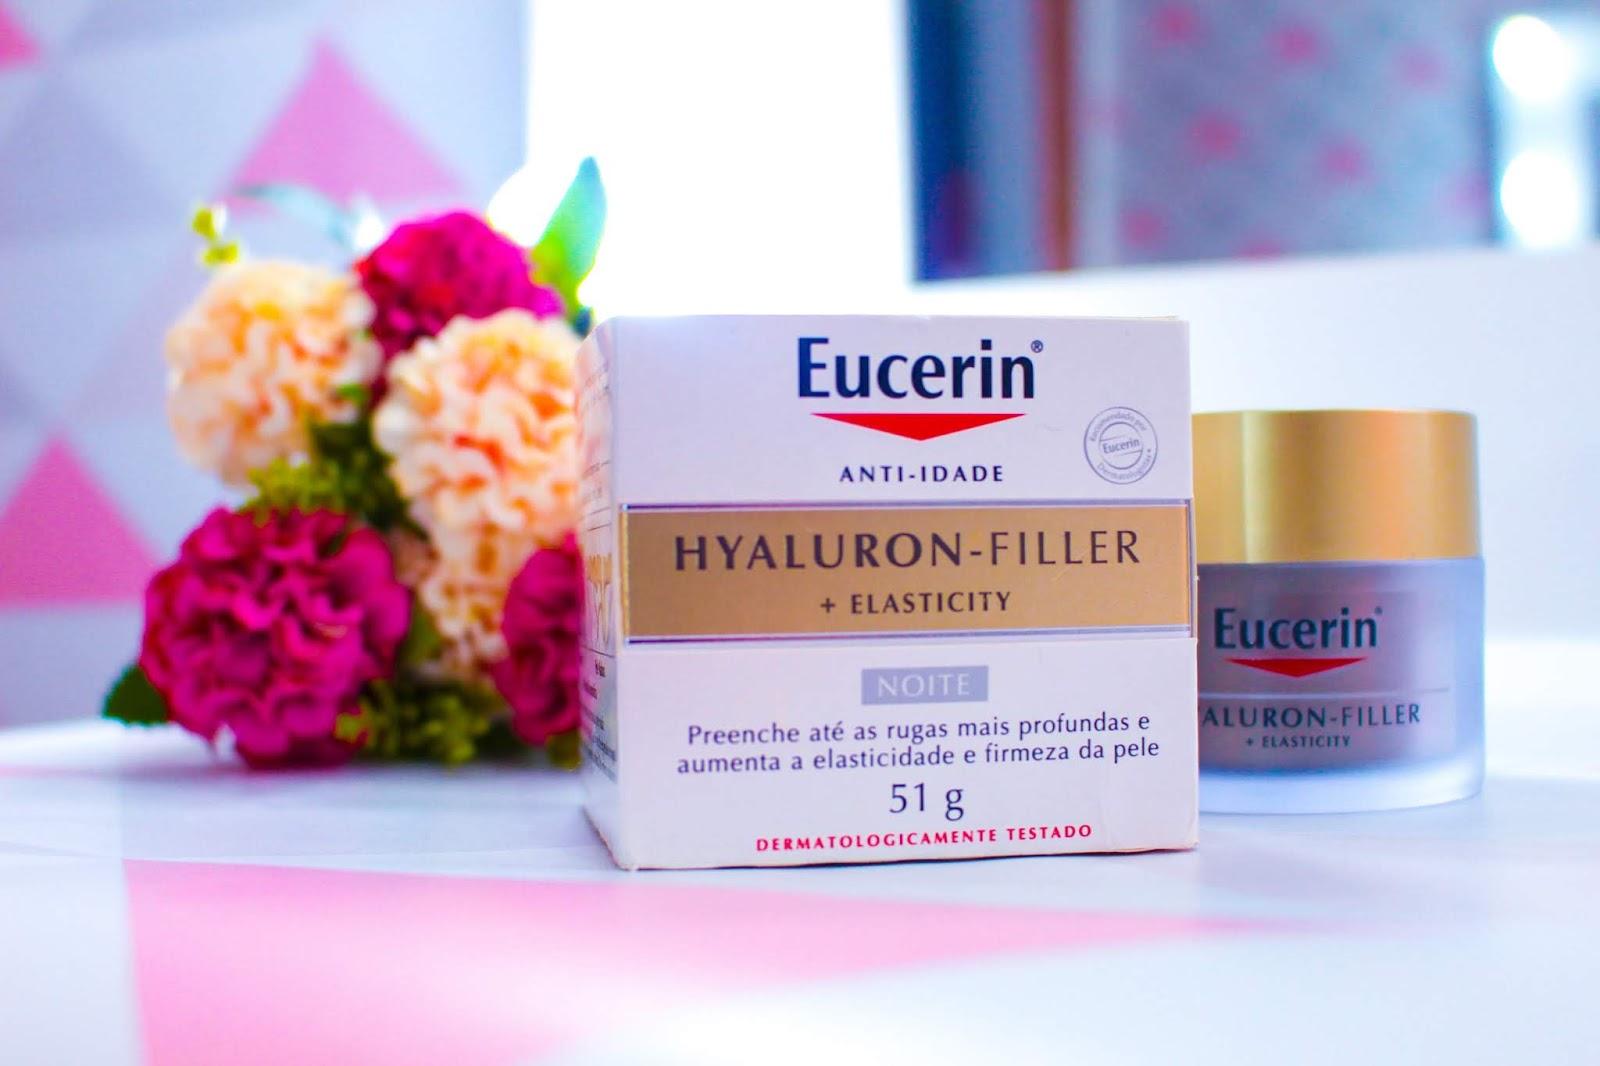 Resenha Anti Idade Eucerin Hyaluron Filler Elasticity Noite